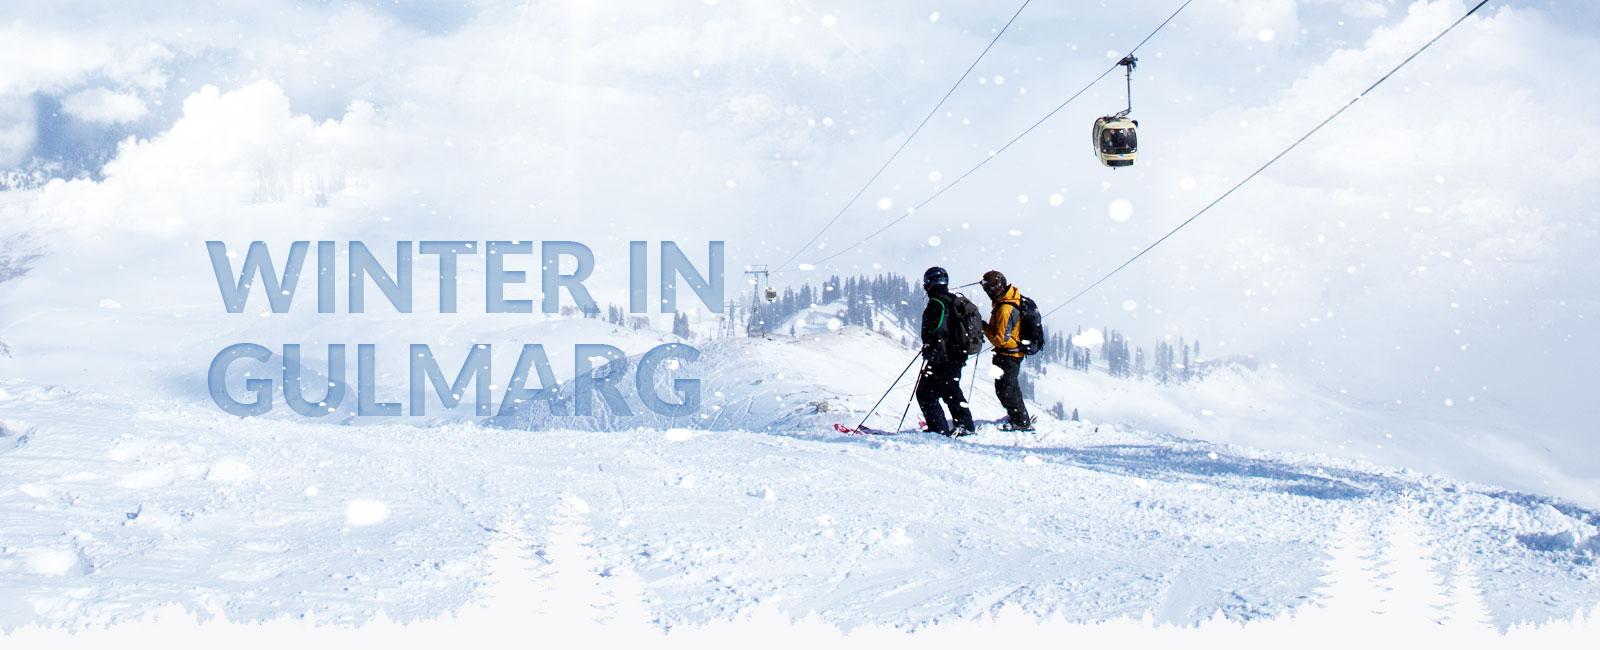 Gulmarg-Winter-Holiday1-1